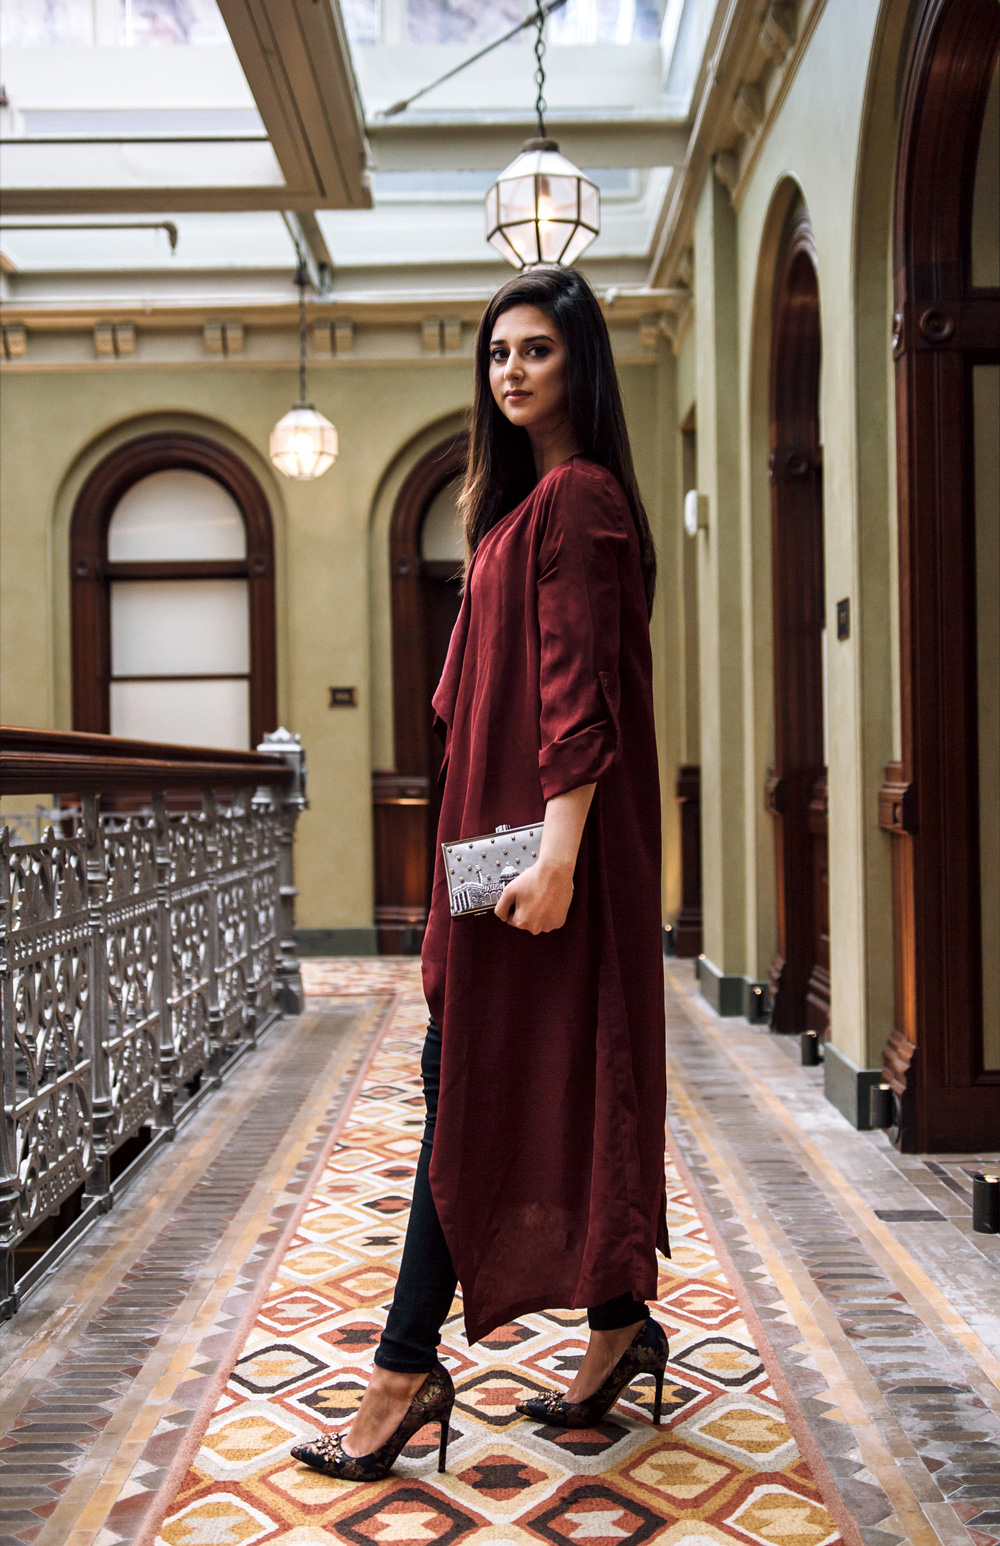 Handbag designer Minza Khan